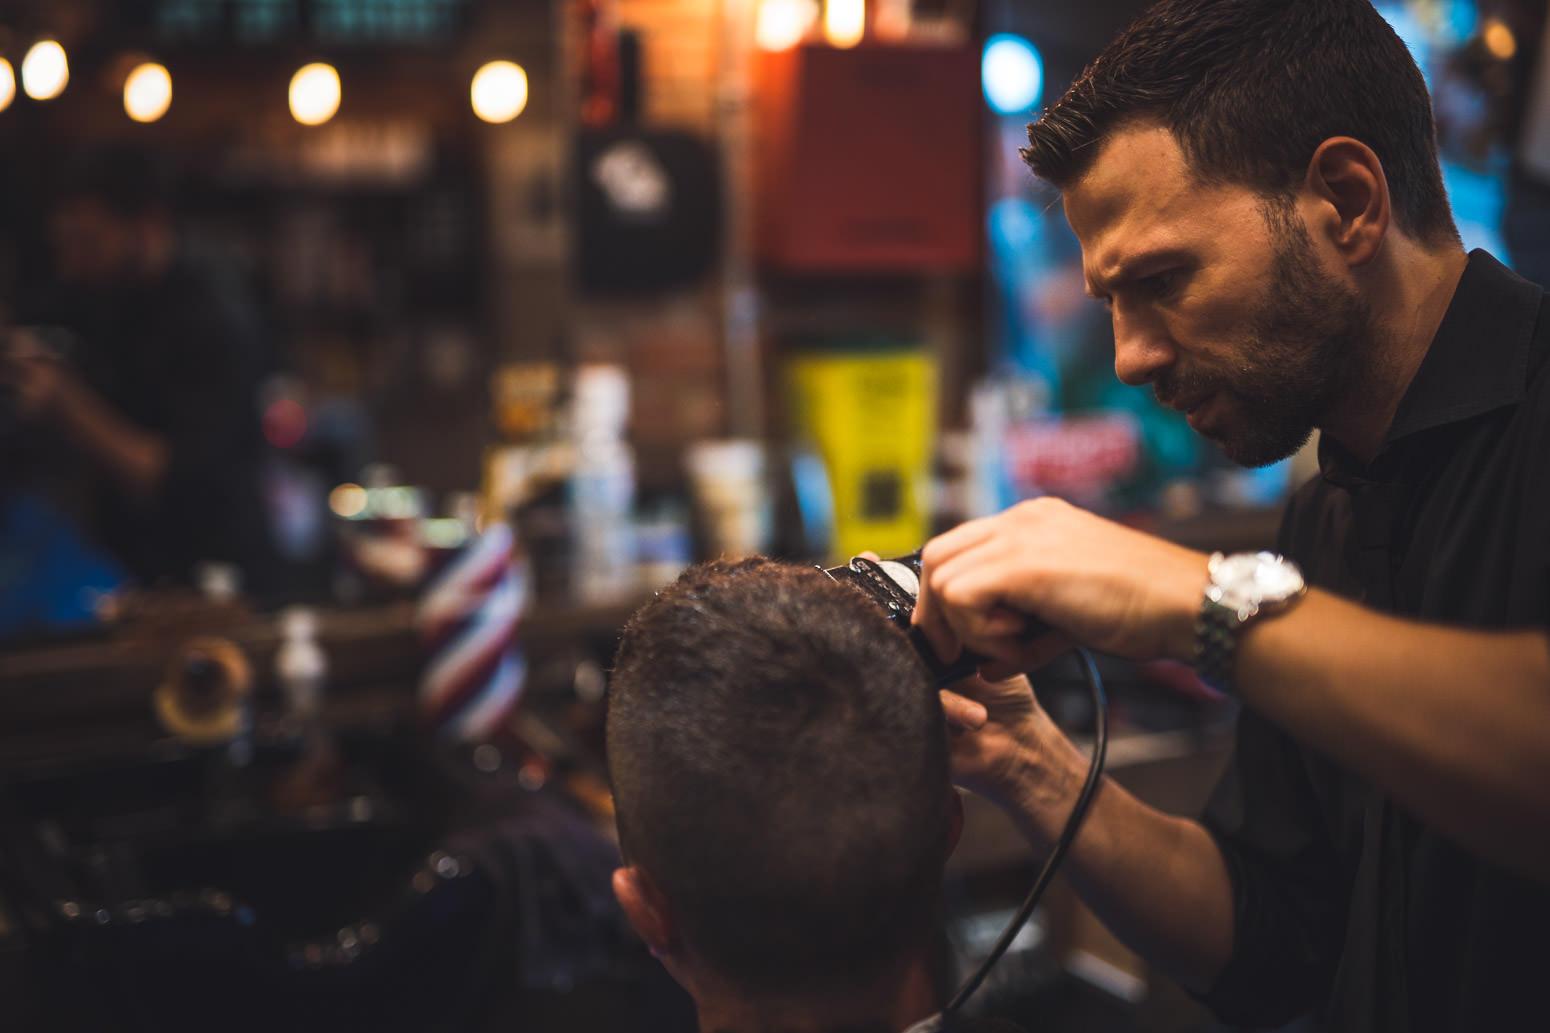 Barber cuts hair at Johnny Cuts Barbershop in Oshawa